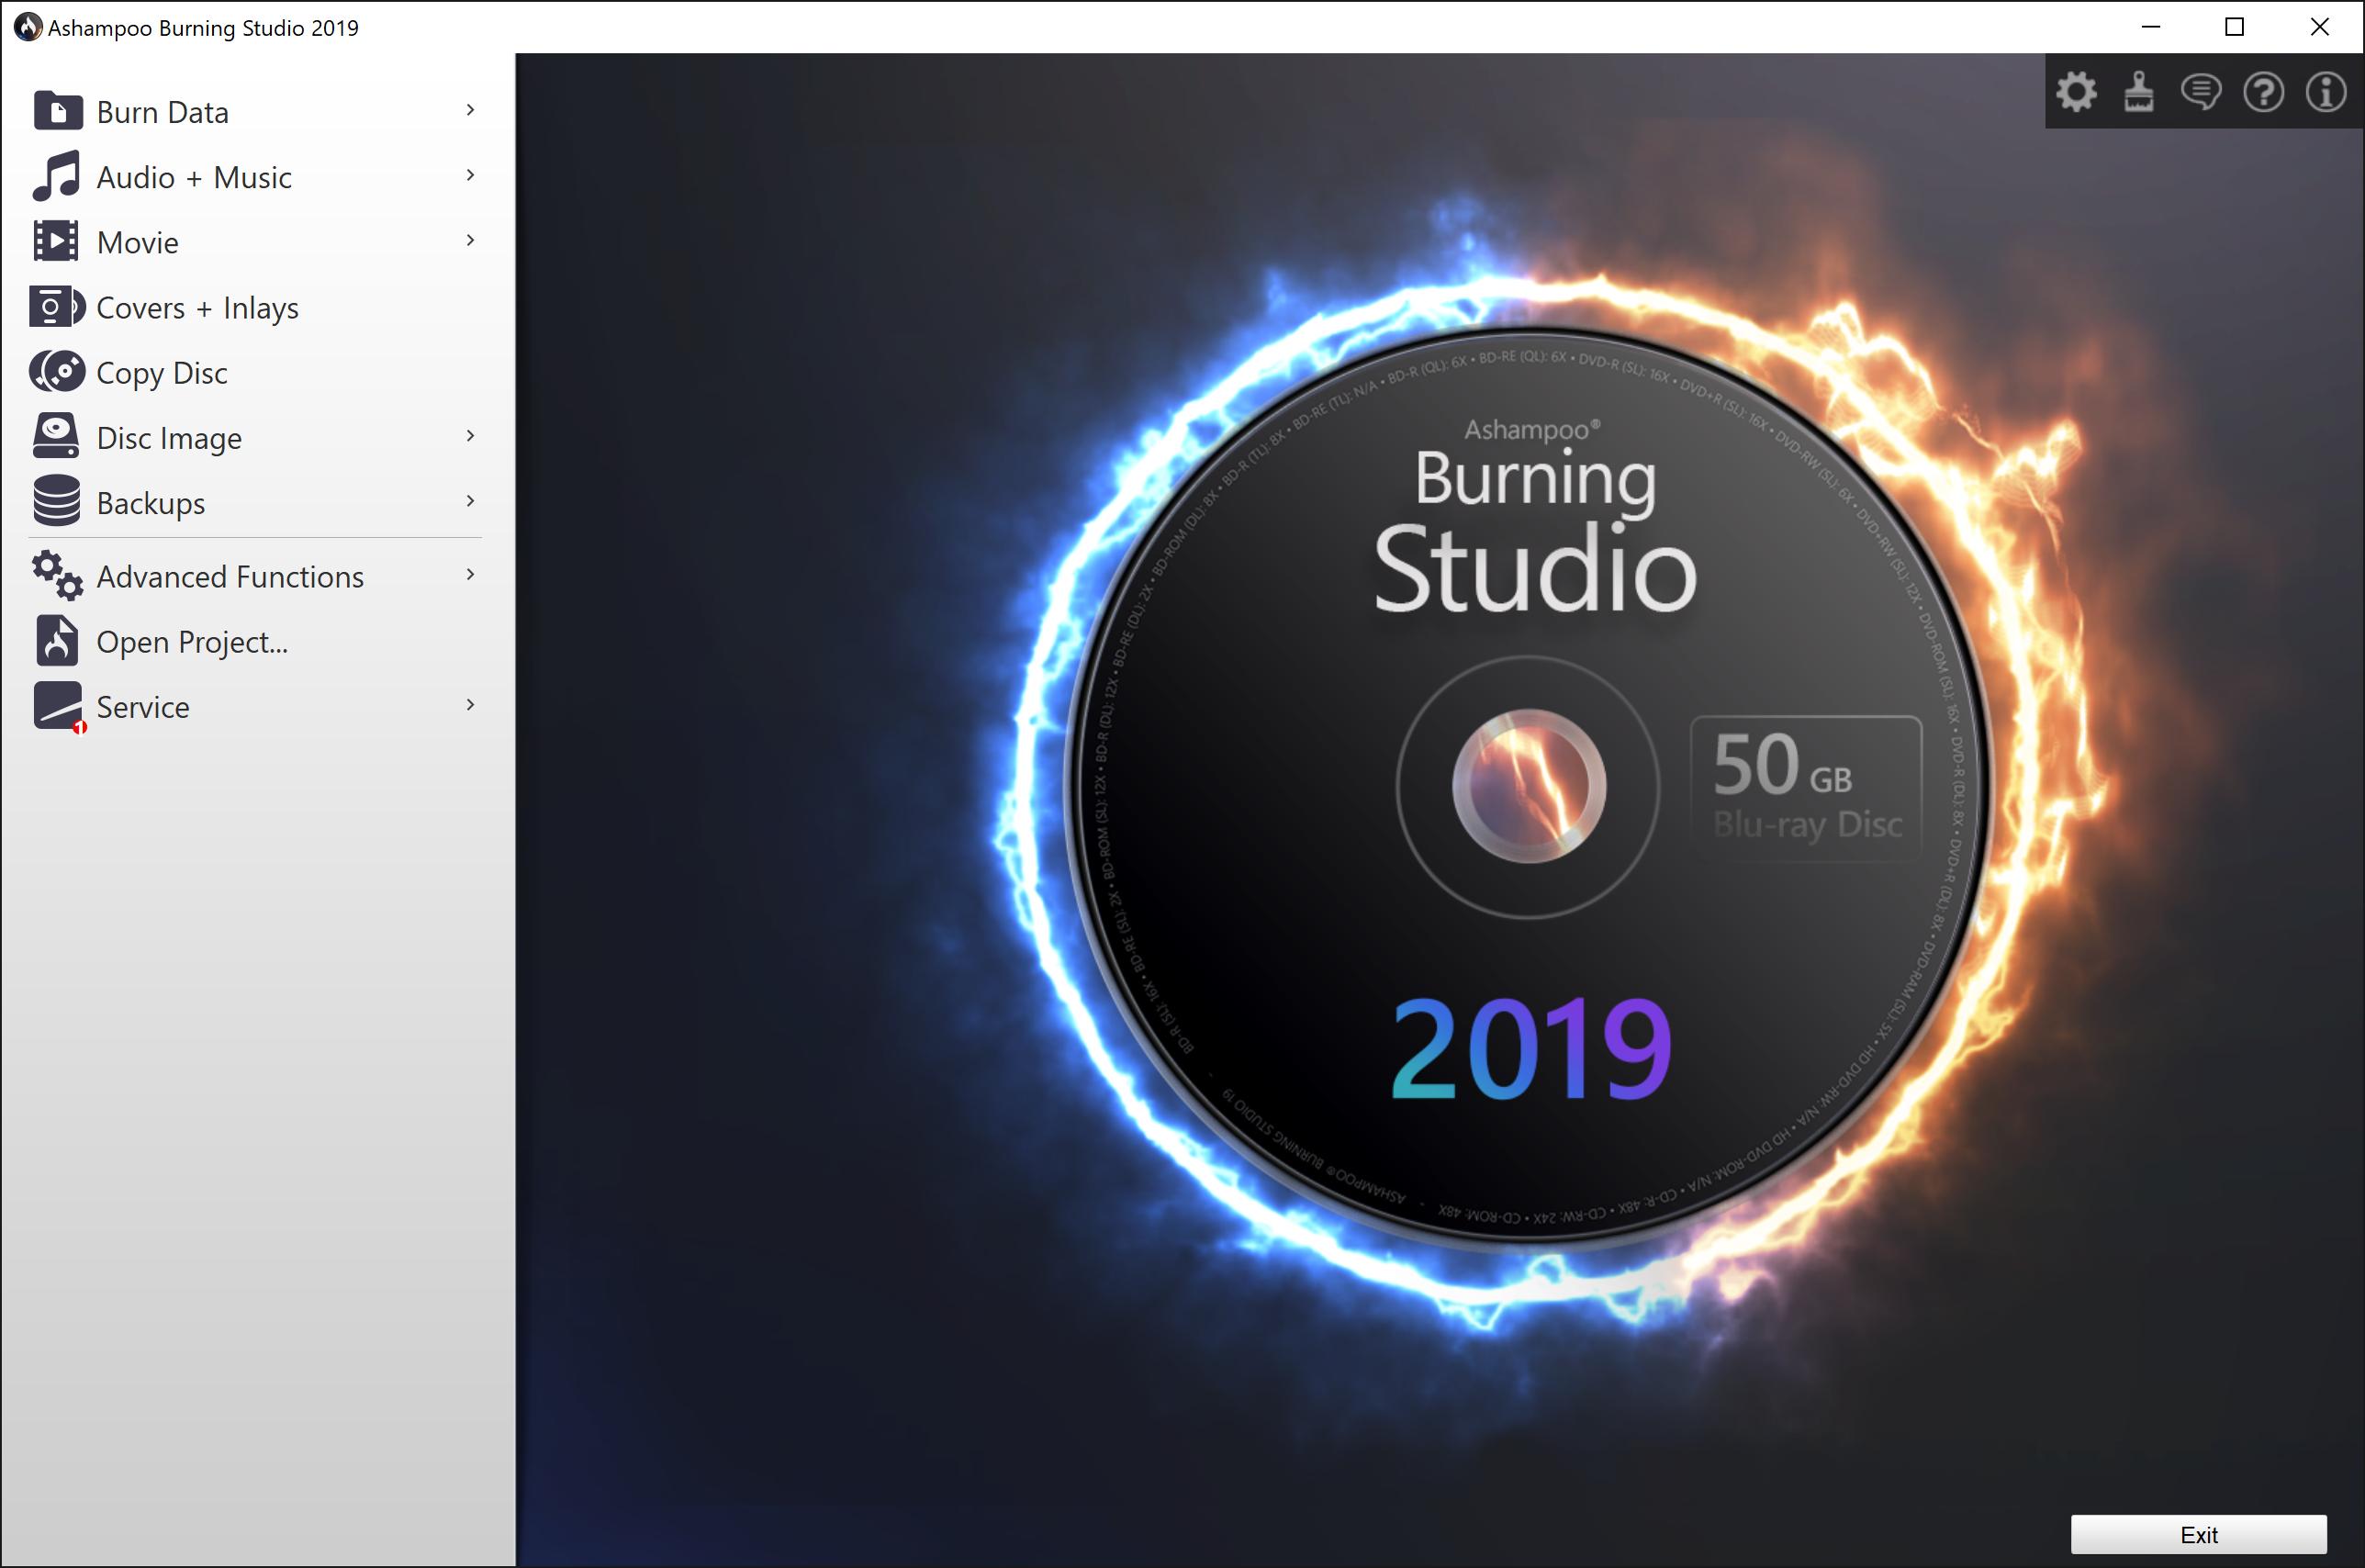 ashampoo burning studio download windows 10